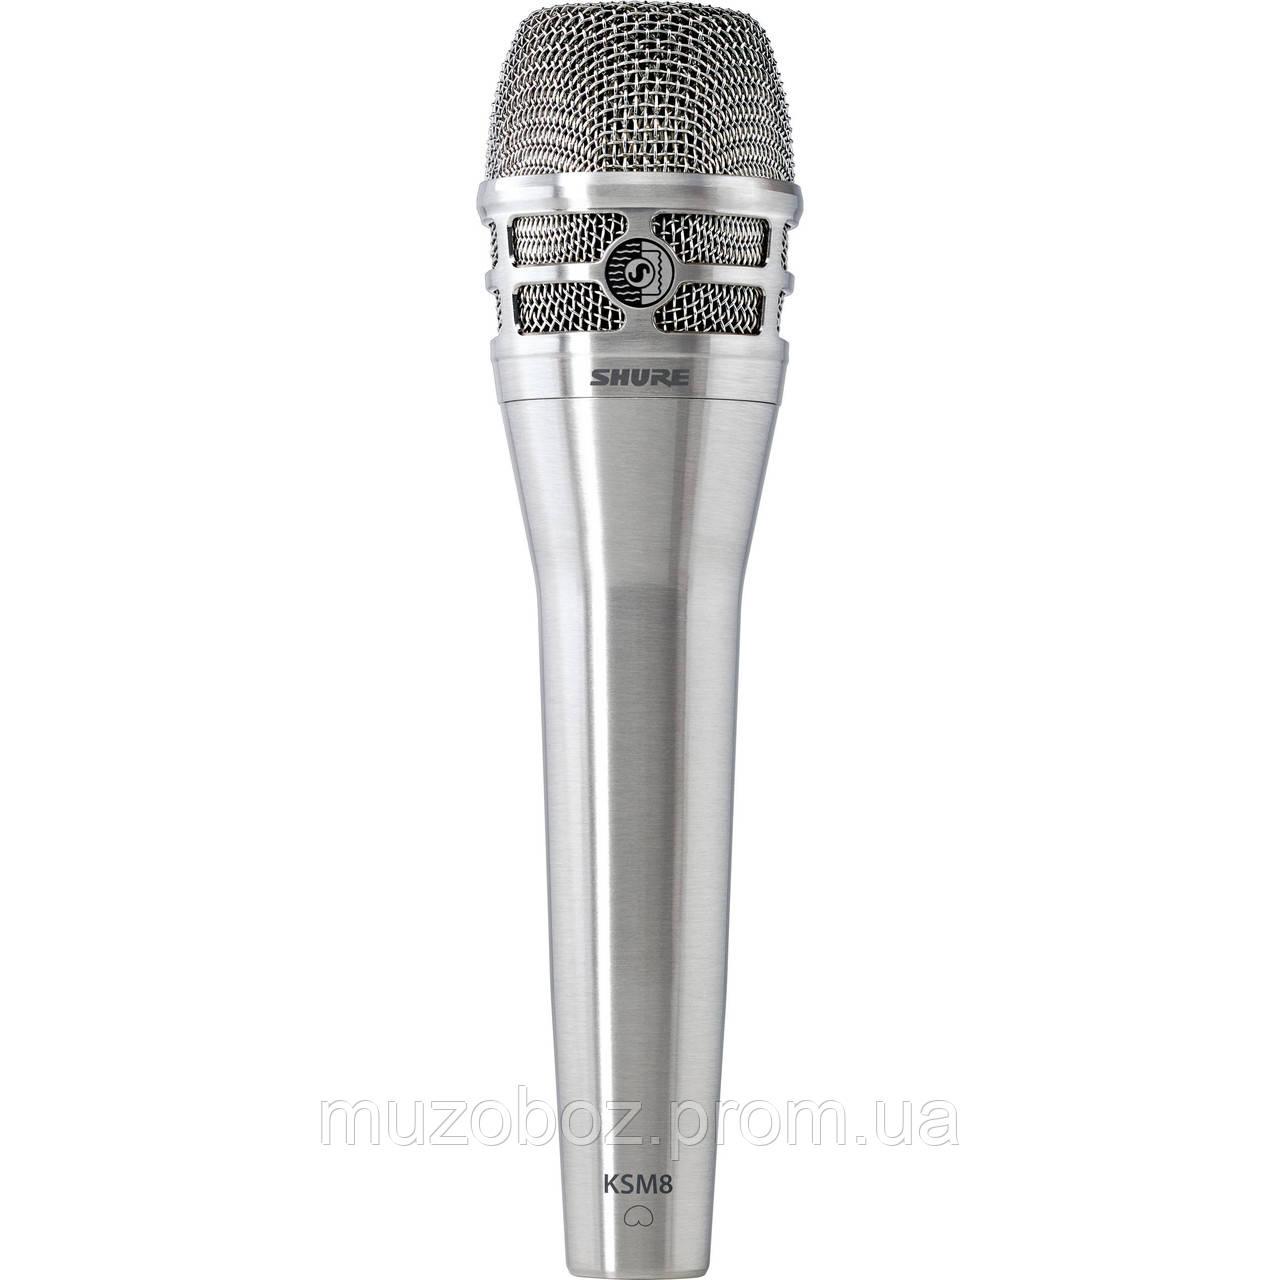 Микрофон Shure KSM8N